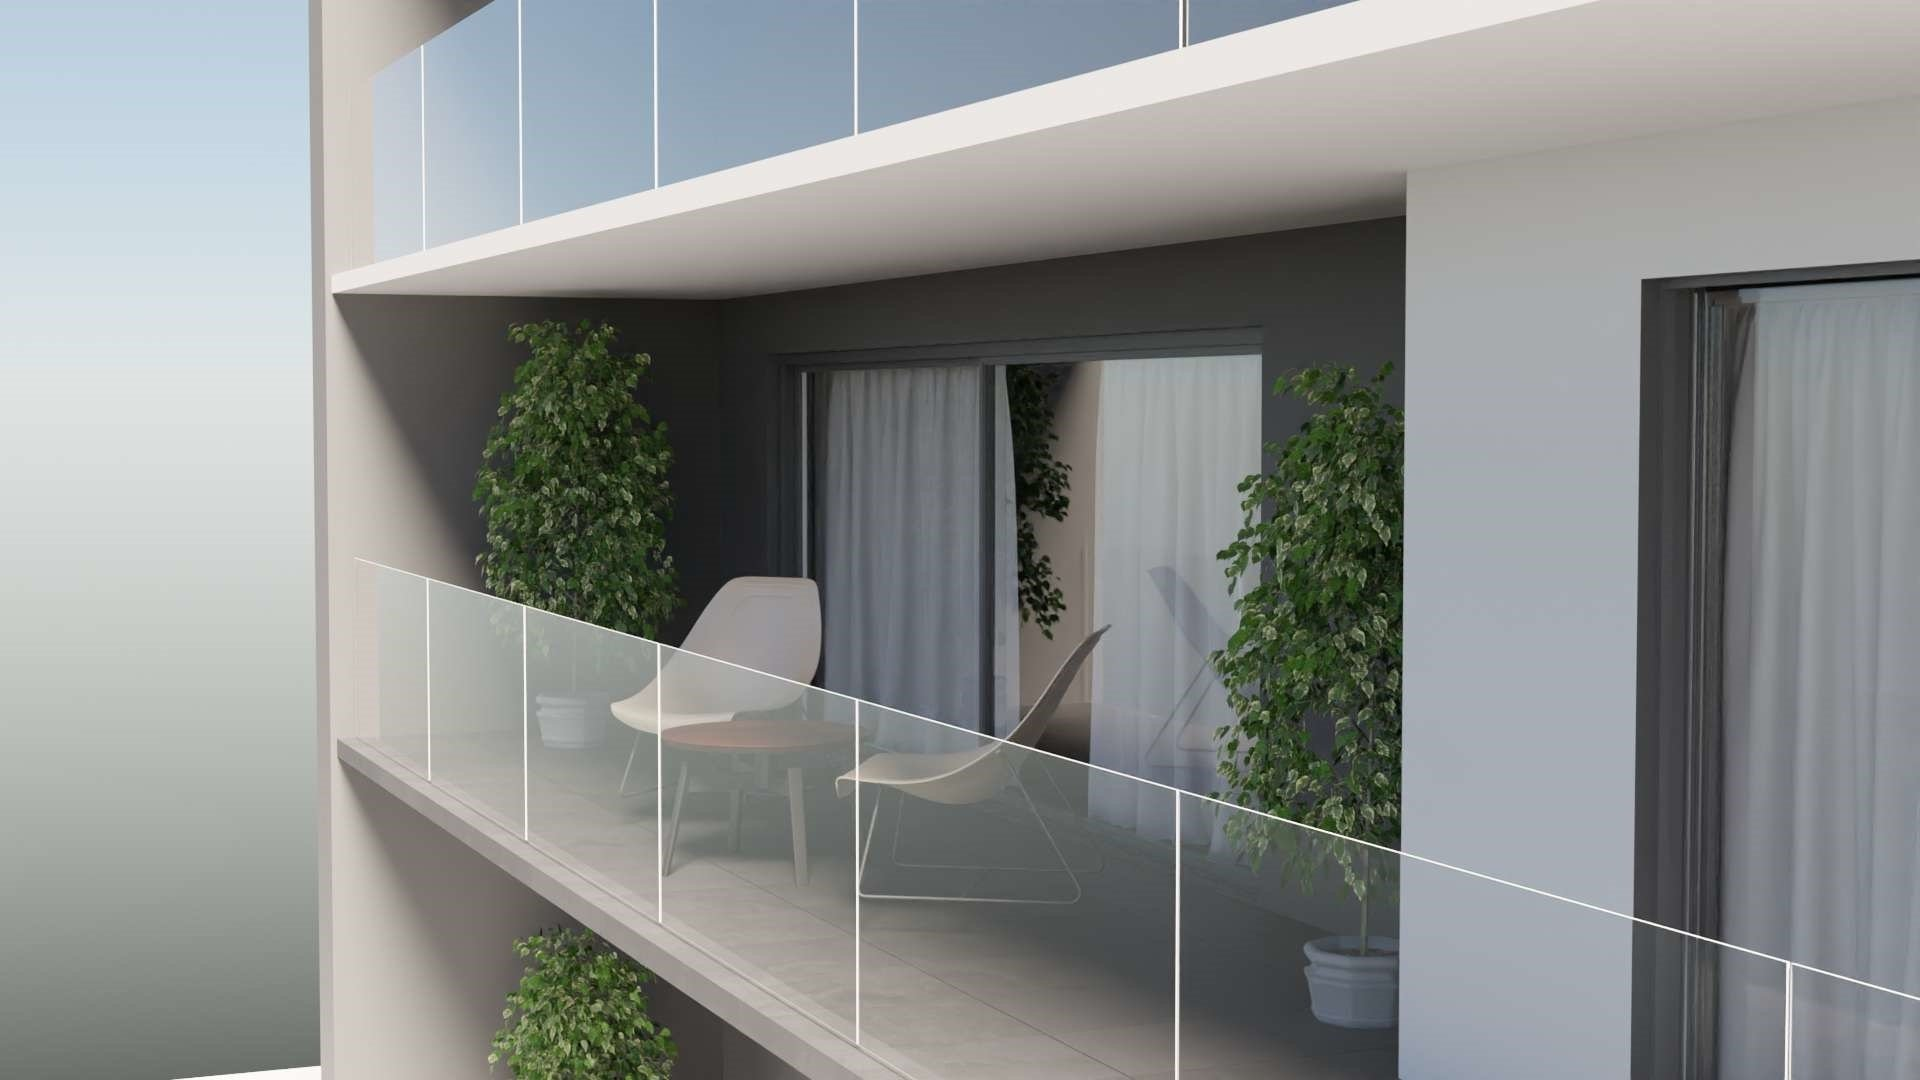 2 Bedroom Apartment Cascais, Lisbon Ref: ASA154G